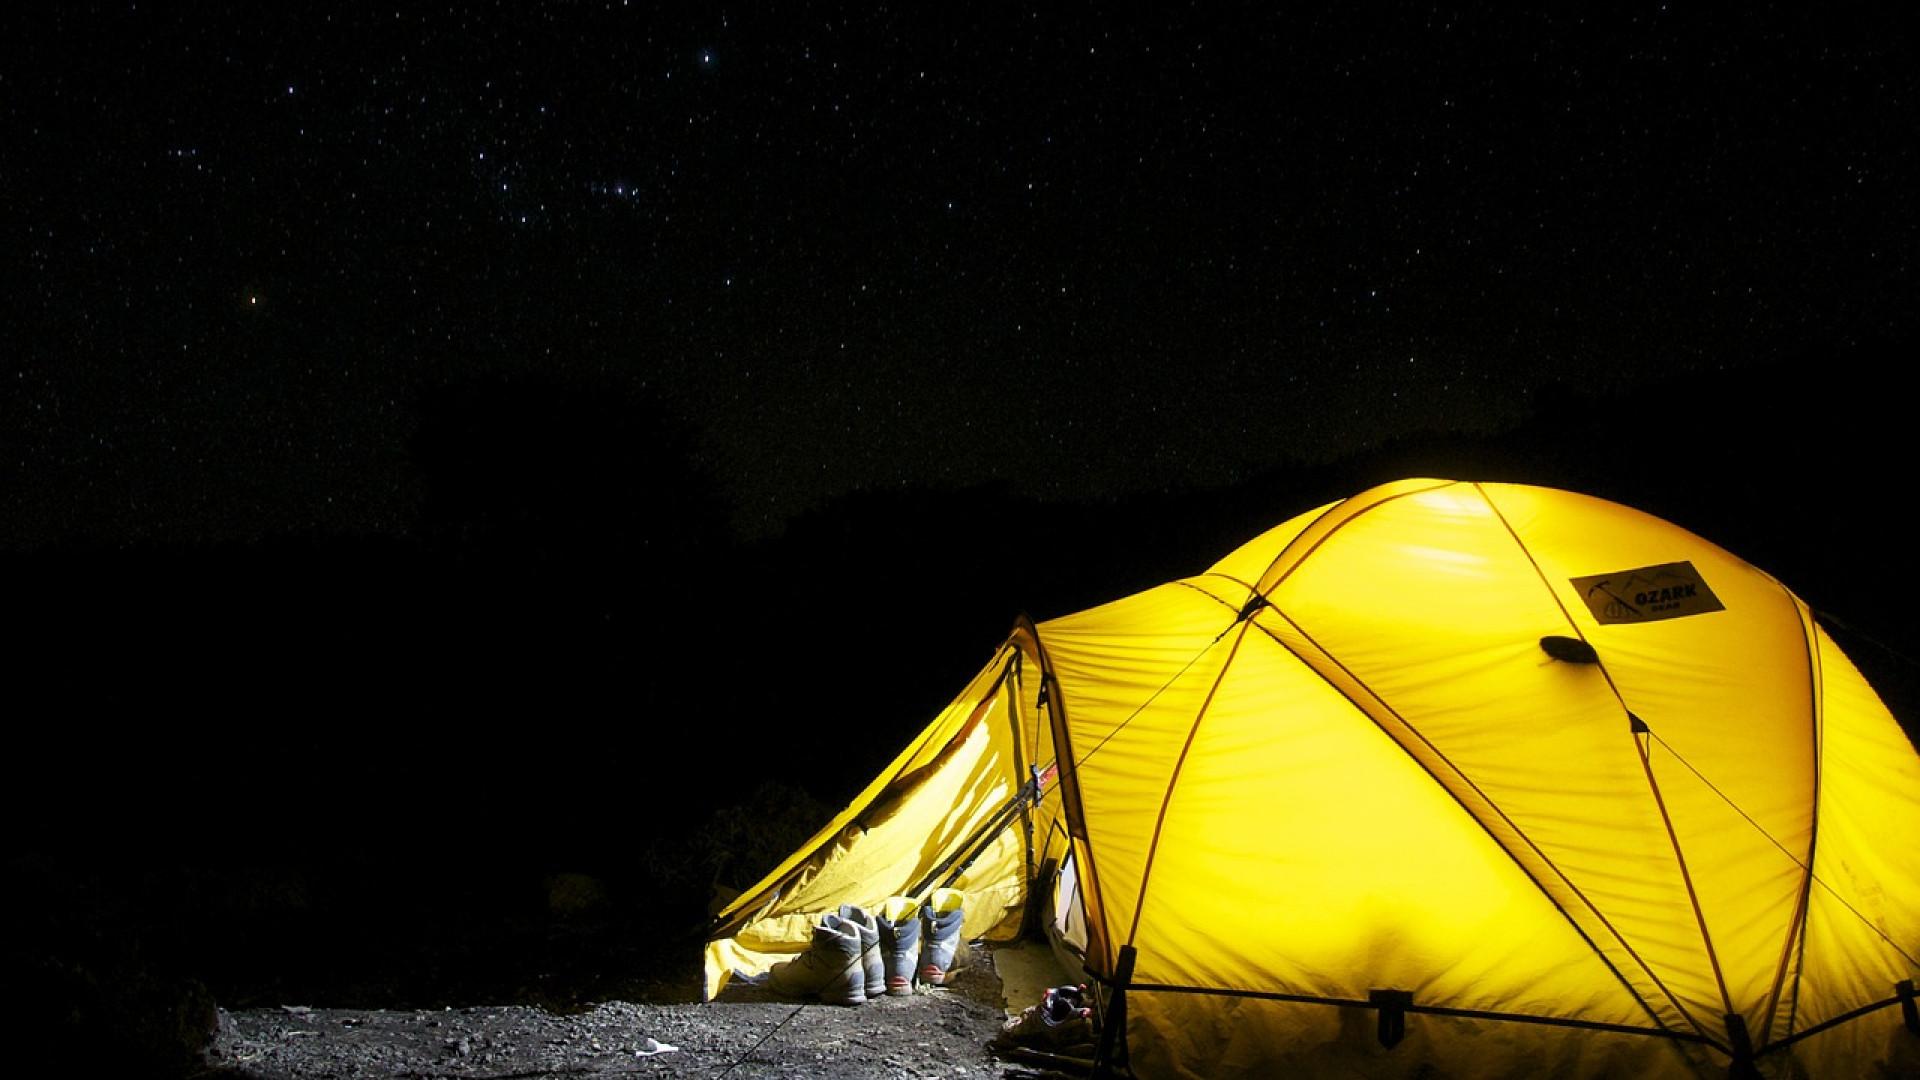 1fa3563793af10faffcd8ca30f28da88 - Vacances en Corse : les bonnes raisons de partir au camping